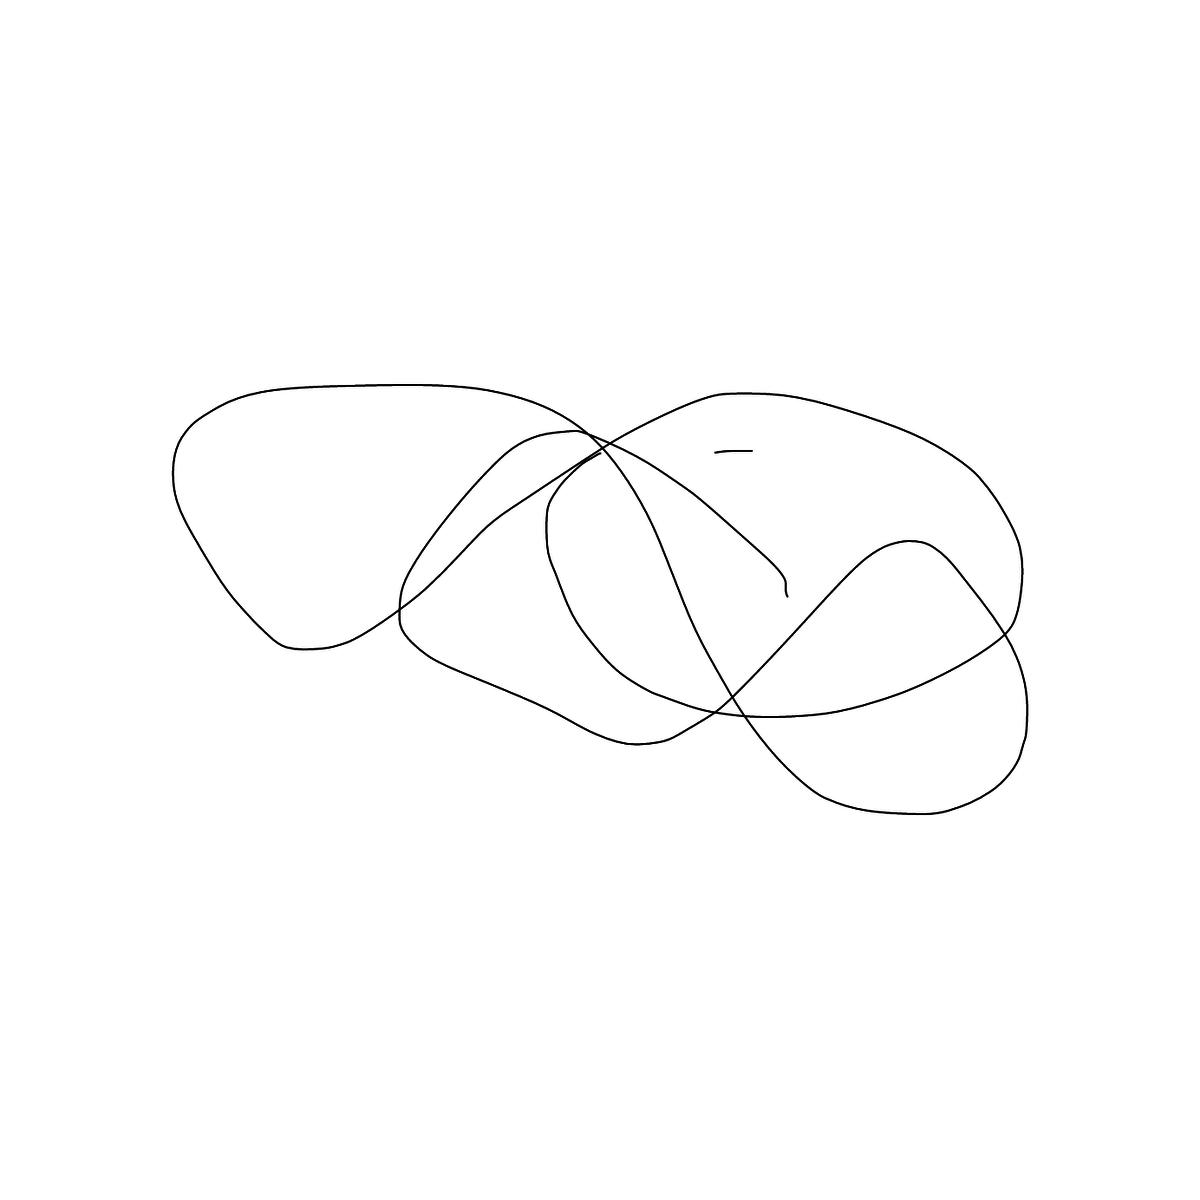 BAAAM drawing#5422 lat:30.1747131347656250lng: -97.8873596191406200